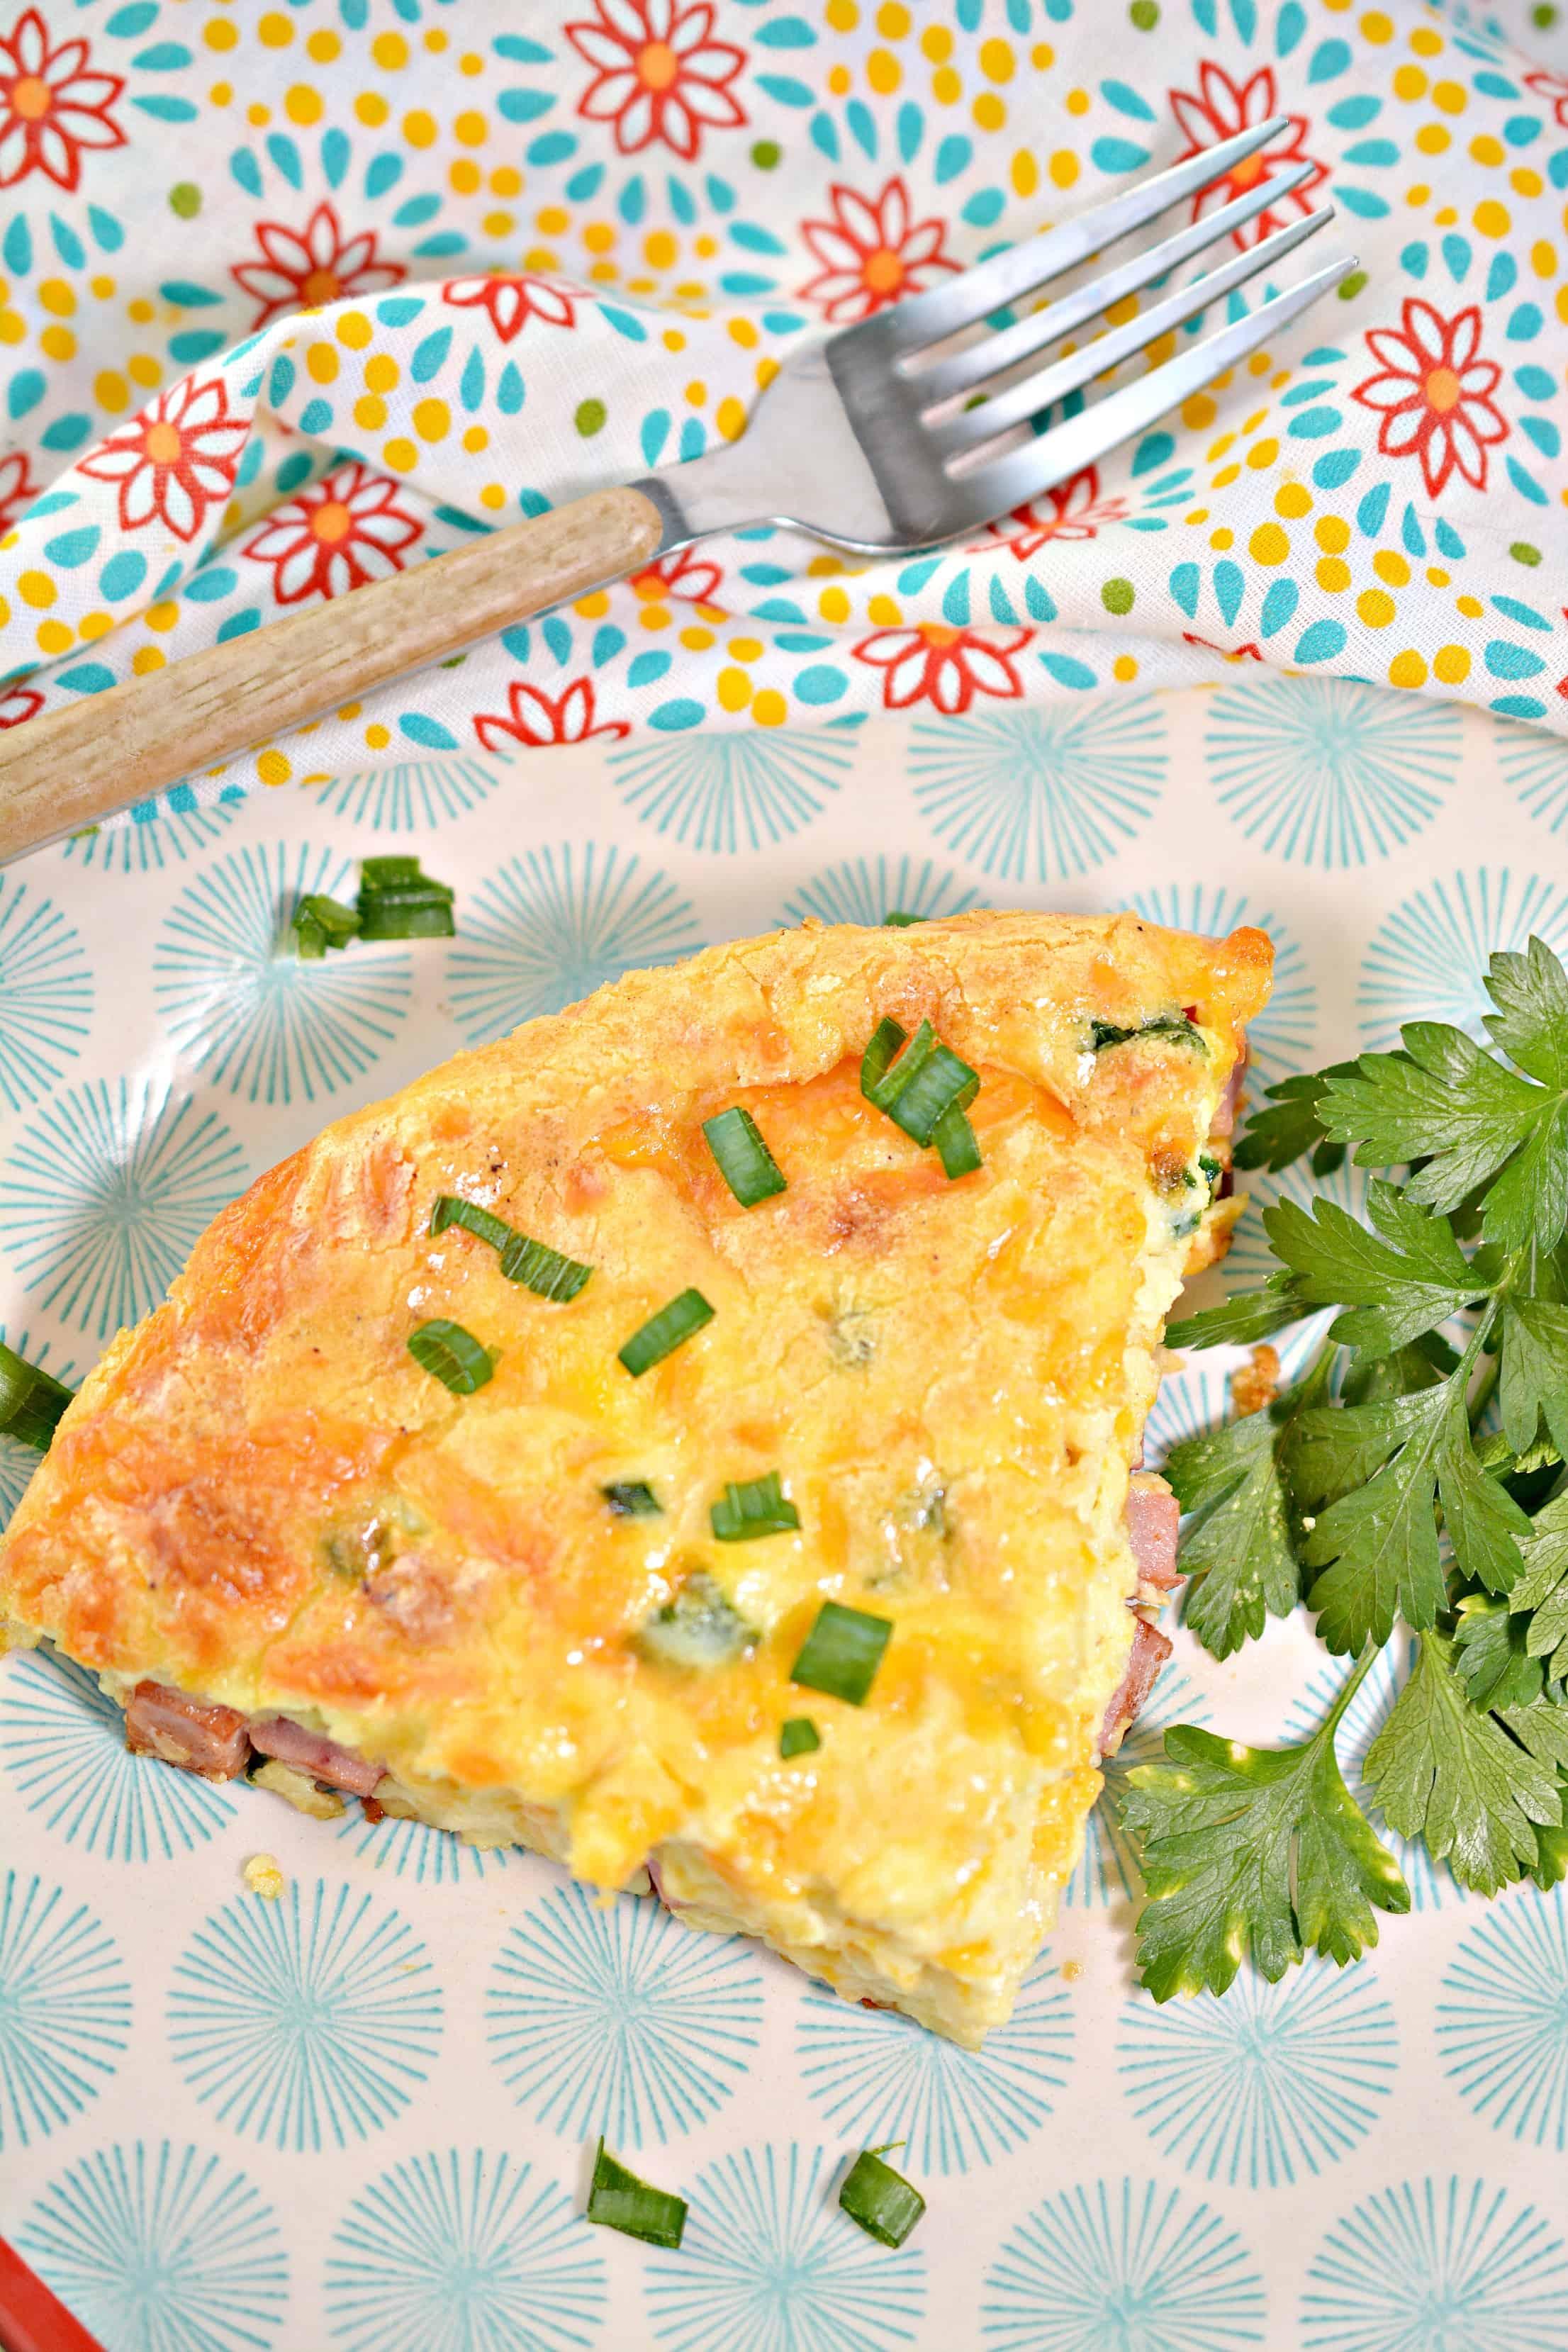 Crustless Ham and Cheese Quiche Recipe